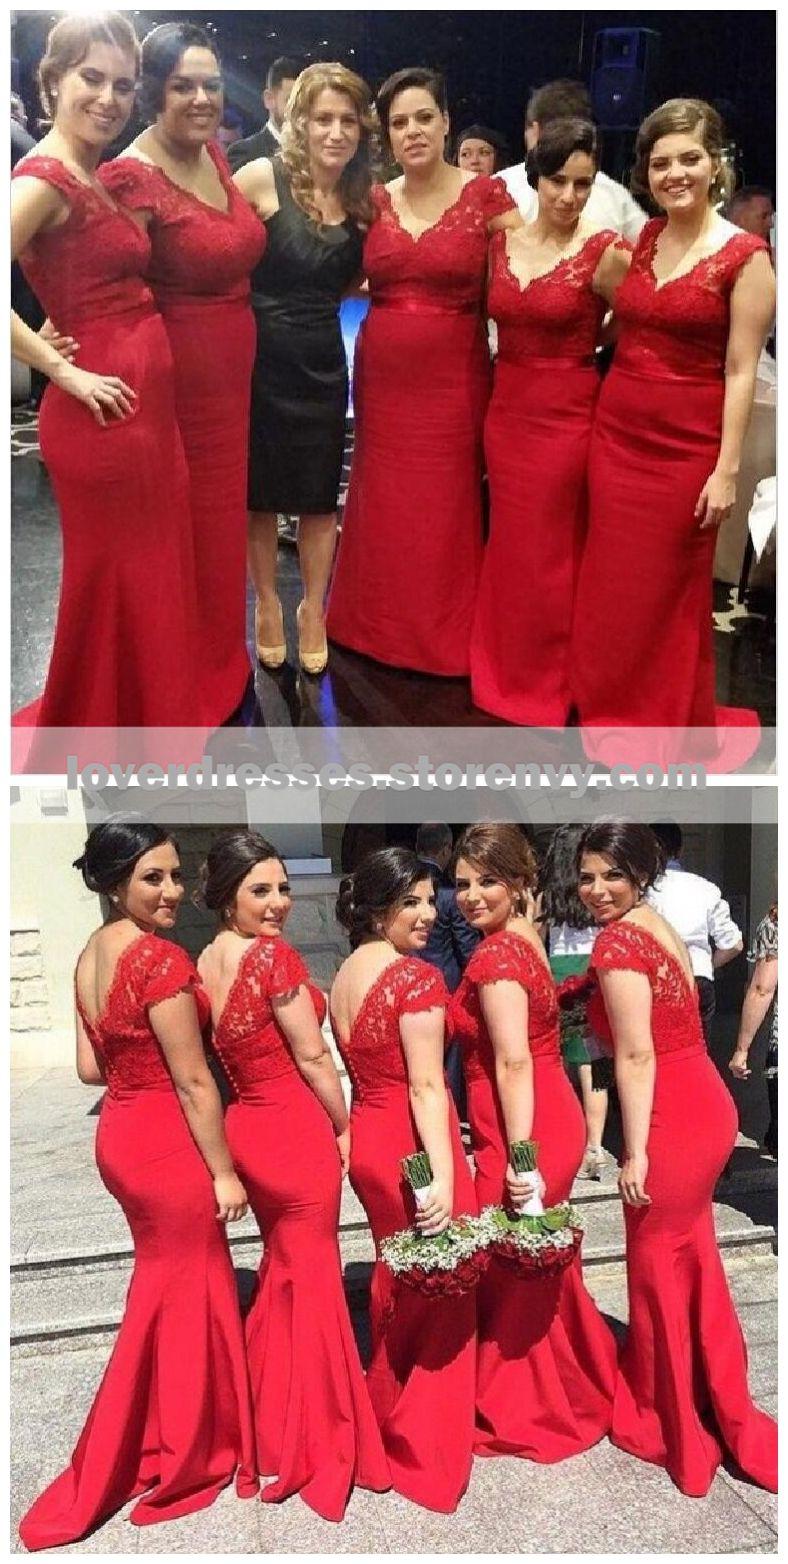 Red bridesmaid dresses off shoulder bridesmaid dresses long